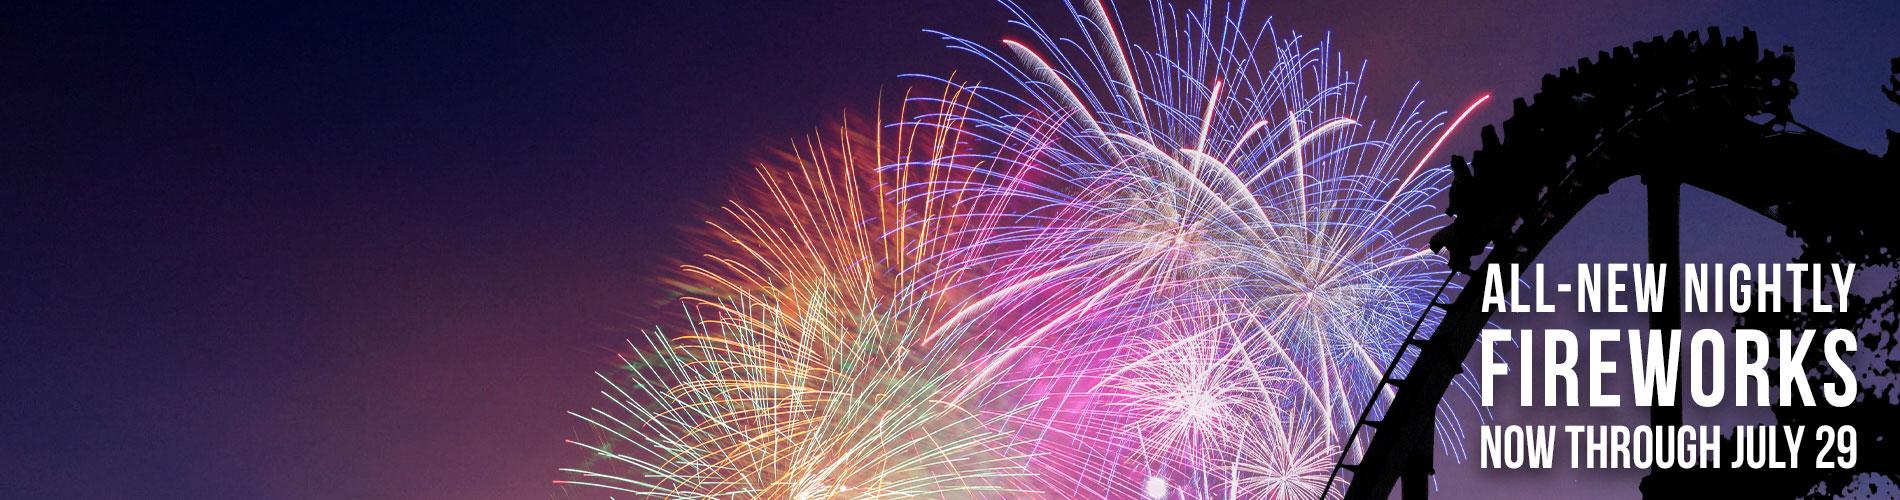 All-New Nightly Fireworks beginning June 21